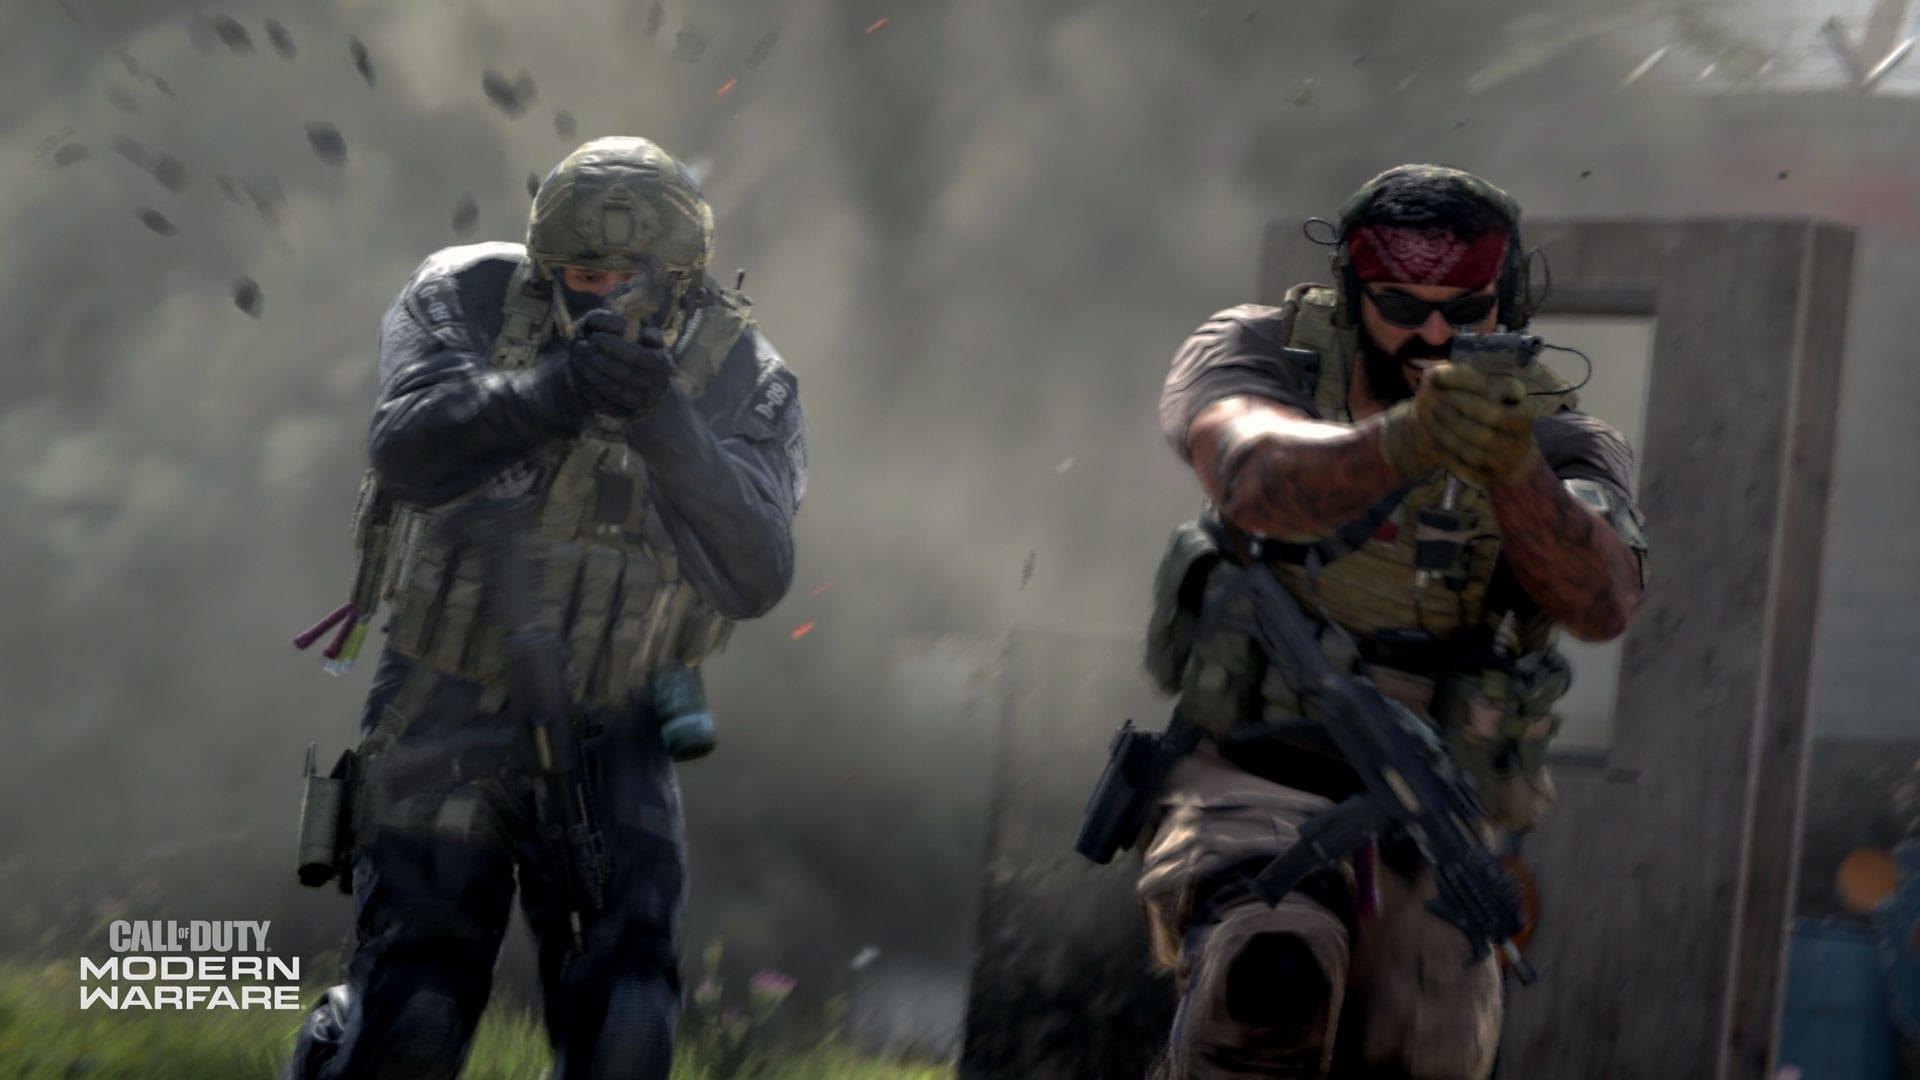 modern warfare, co-op multiplayer